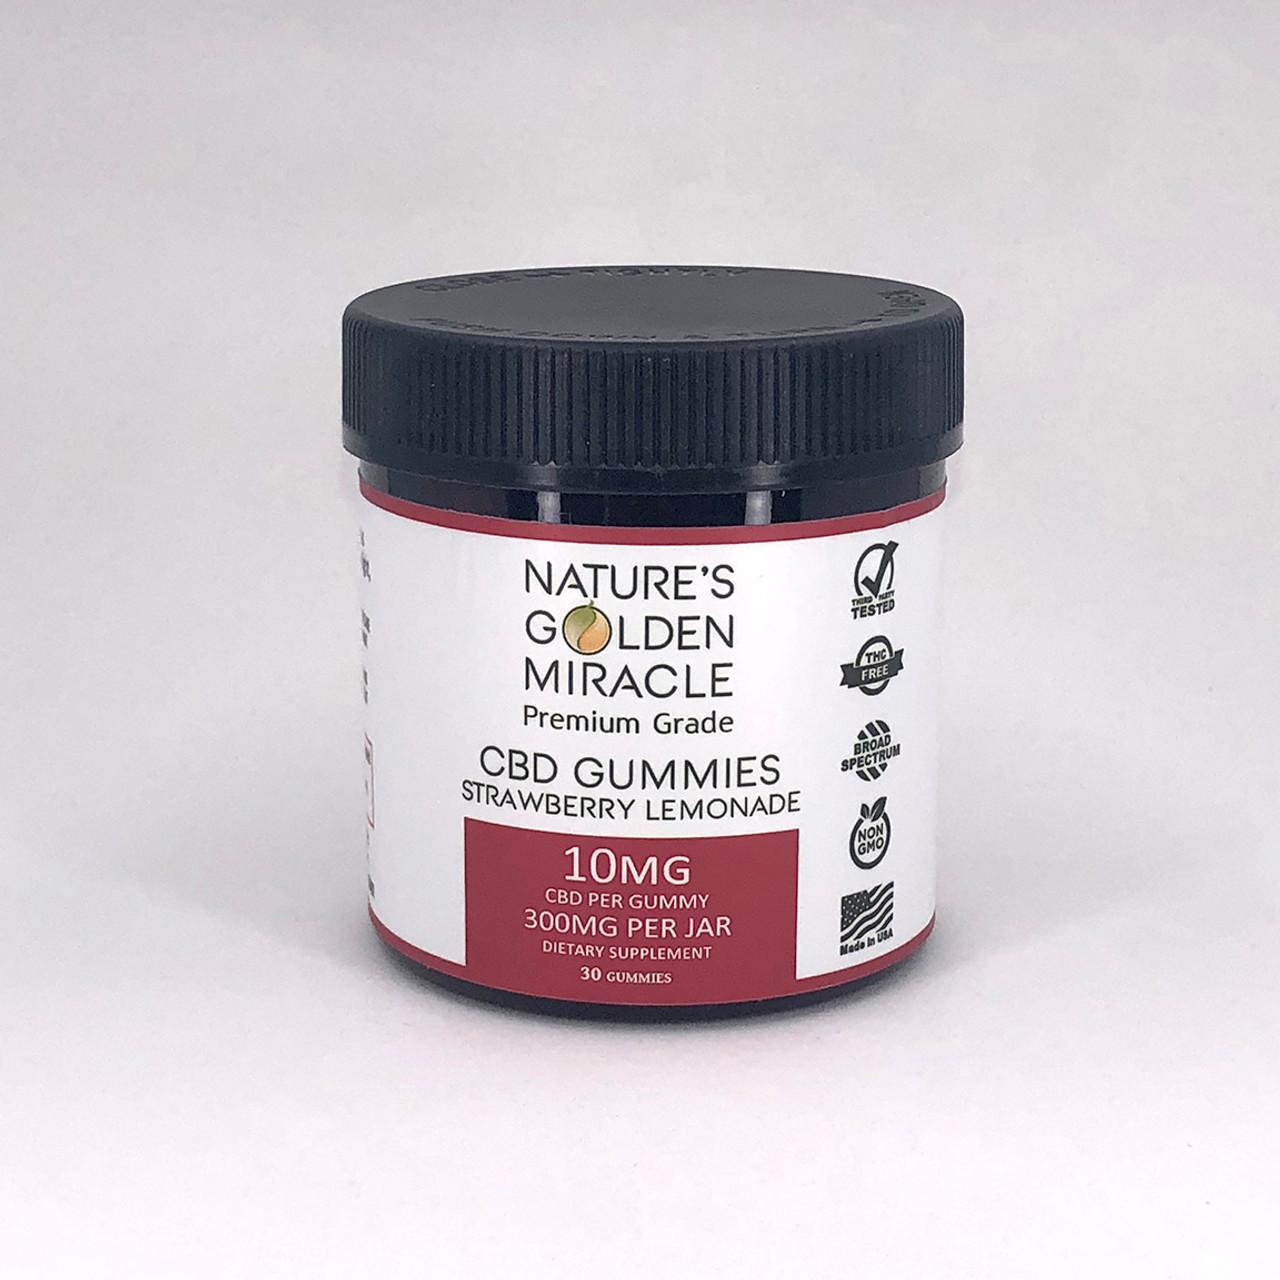 Nature's Golden Miracle premium grade THC-free strawberry lemonade CBD Gummies